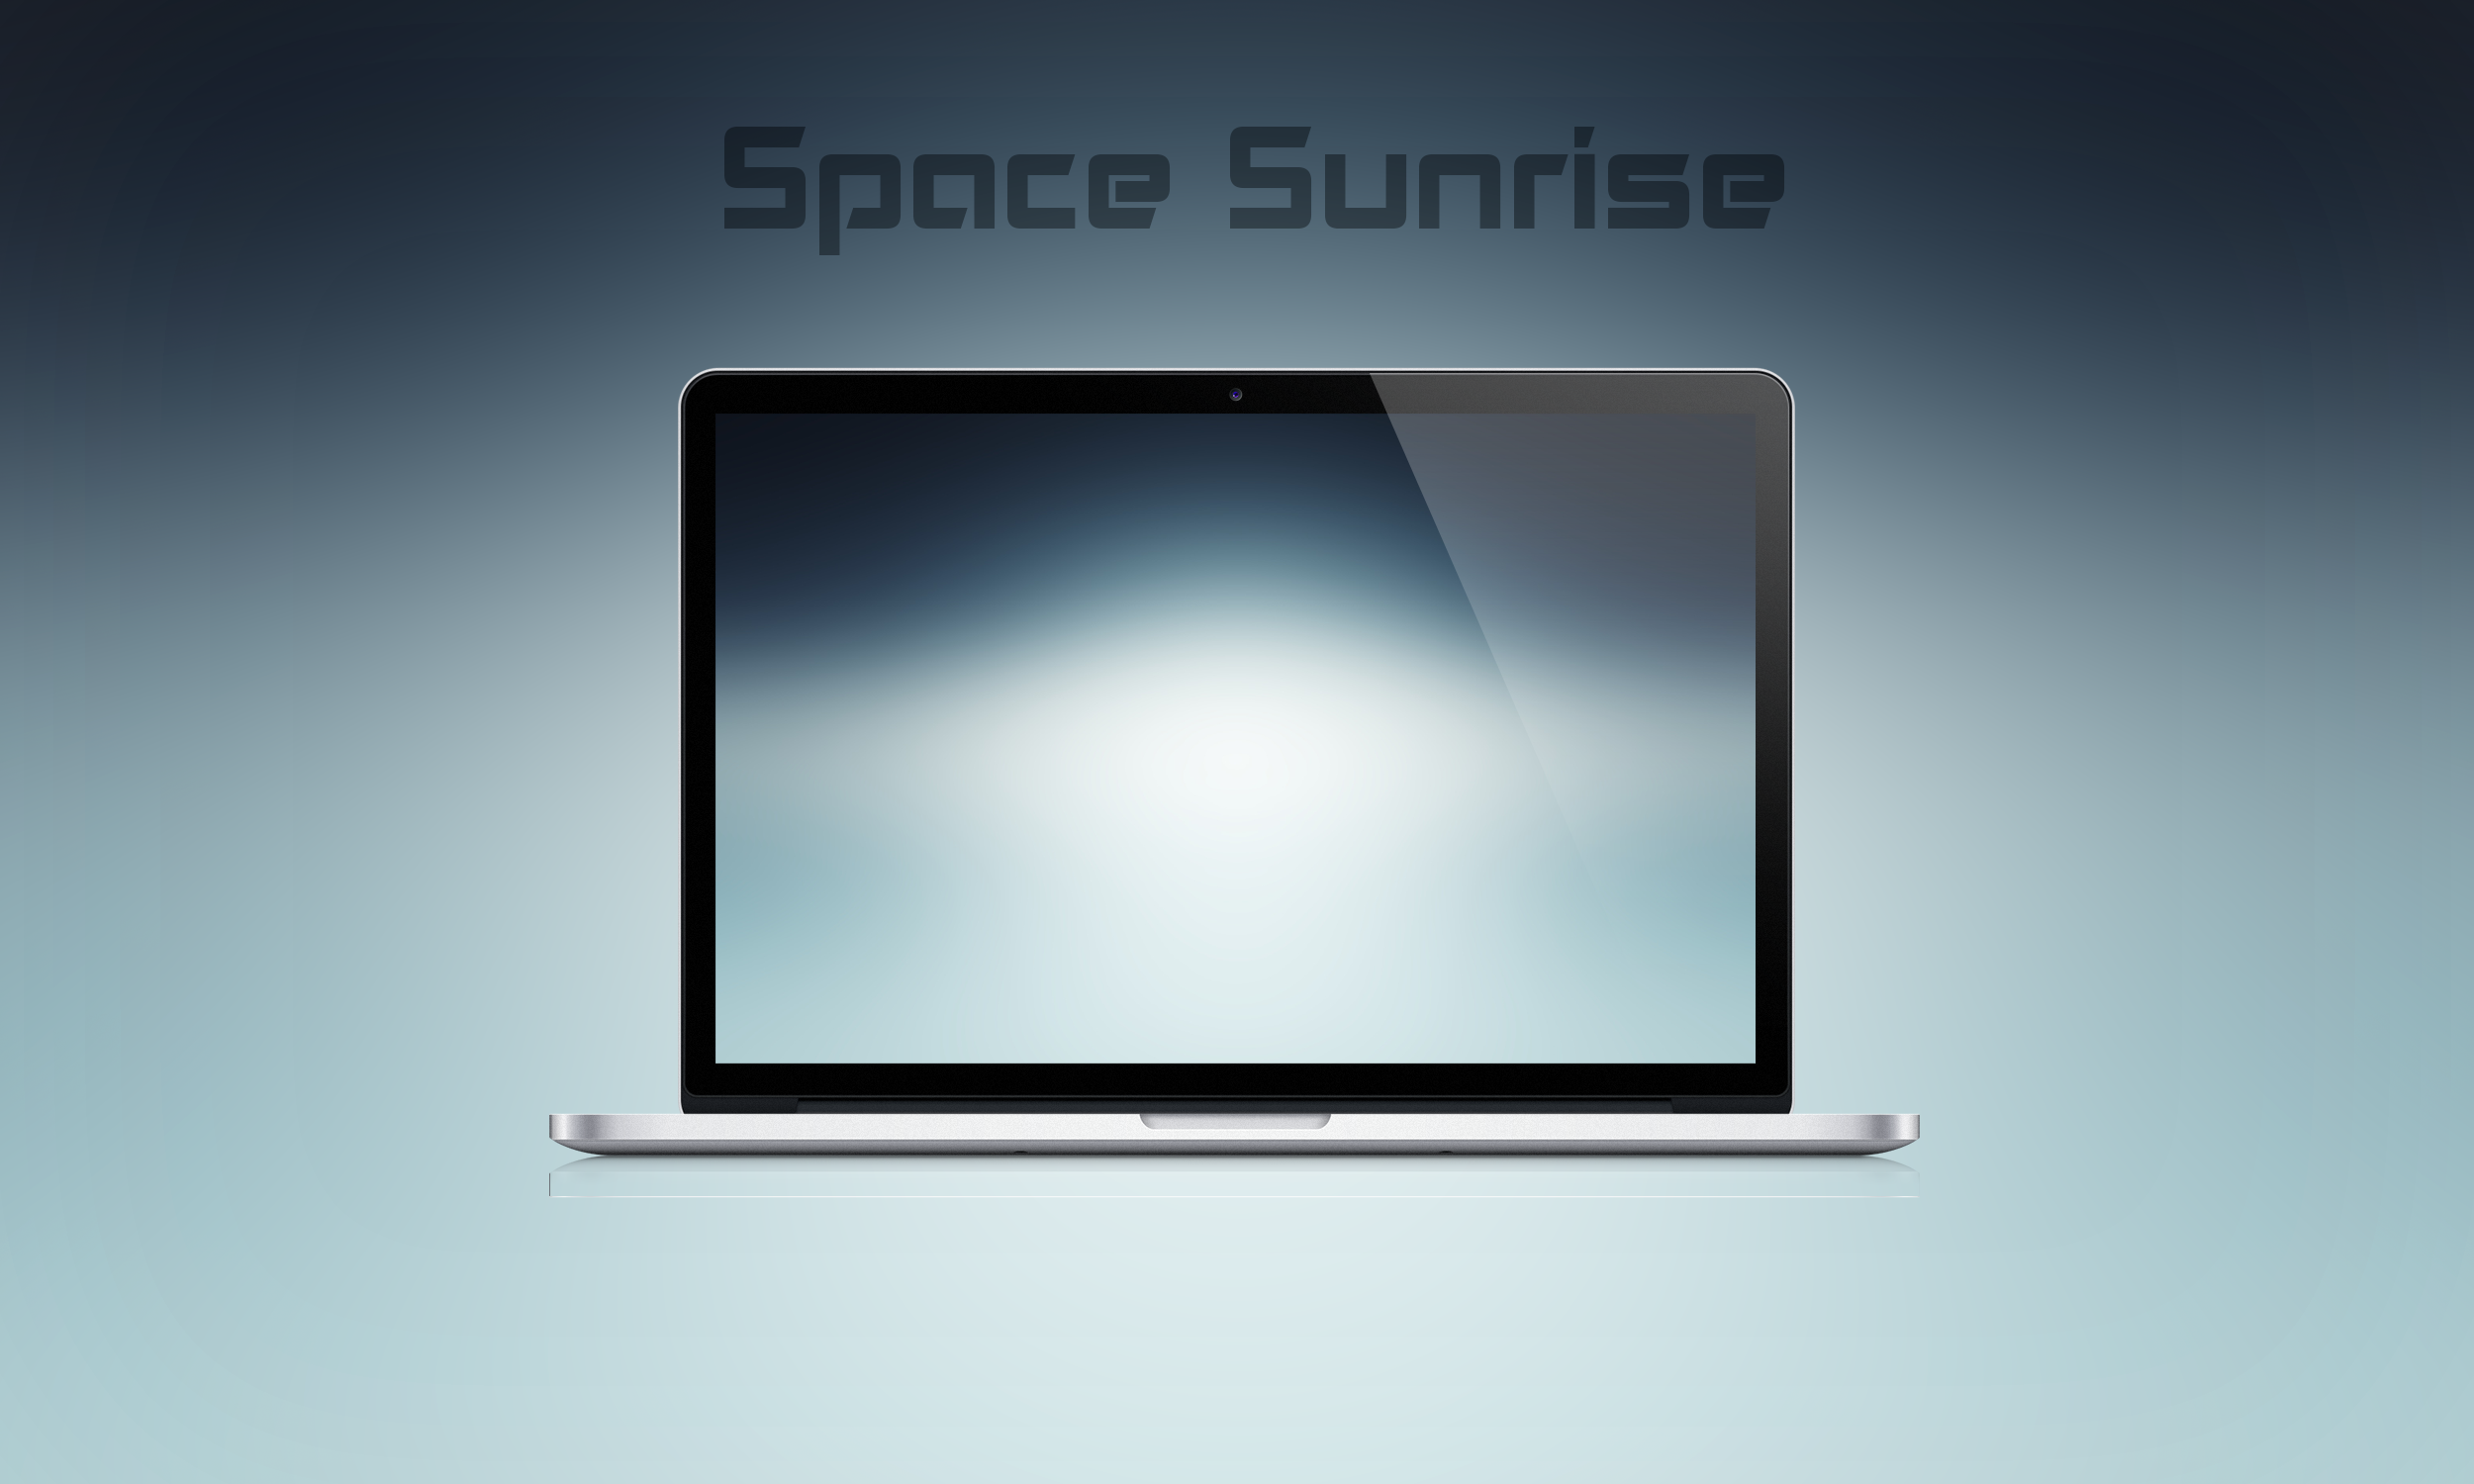 SpaceSunrise by Techz59